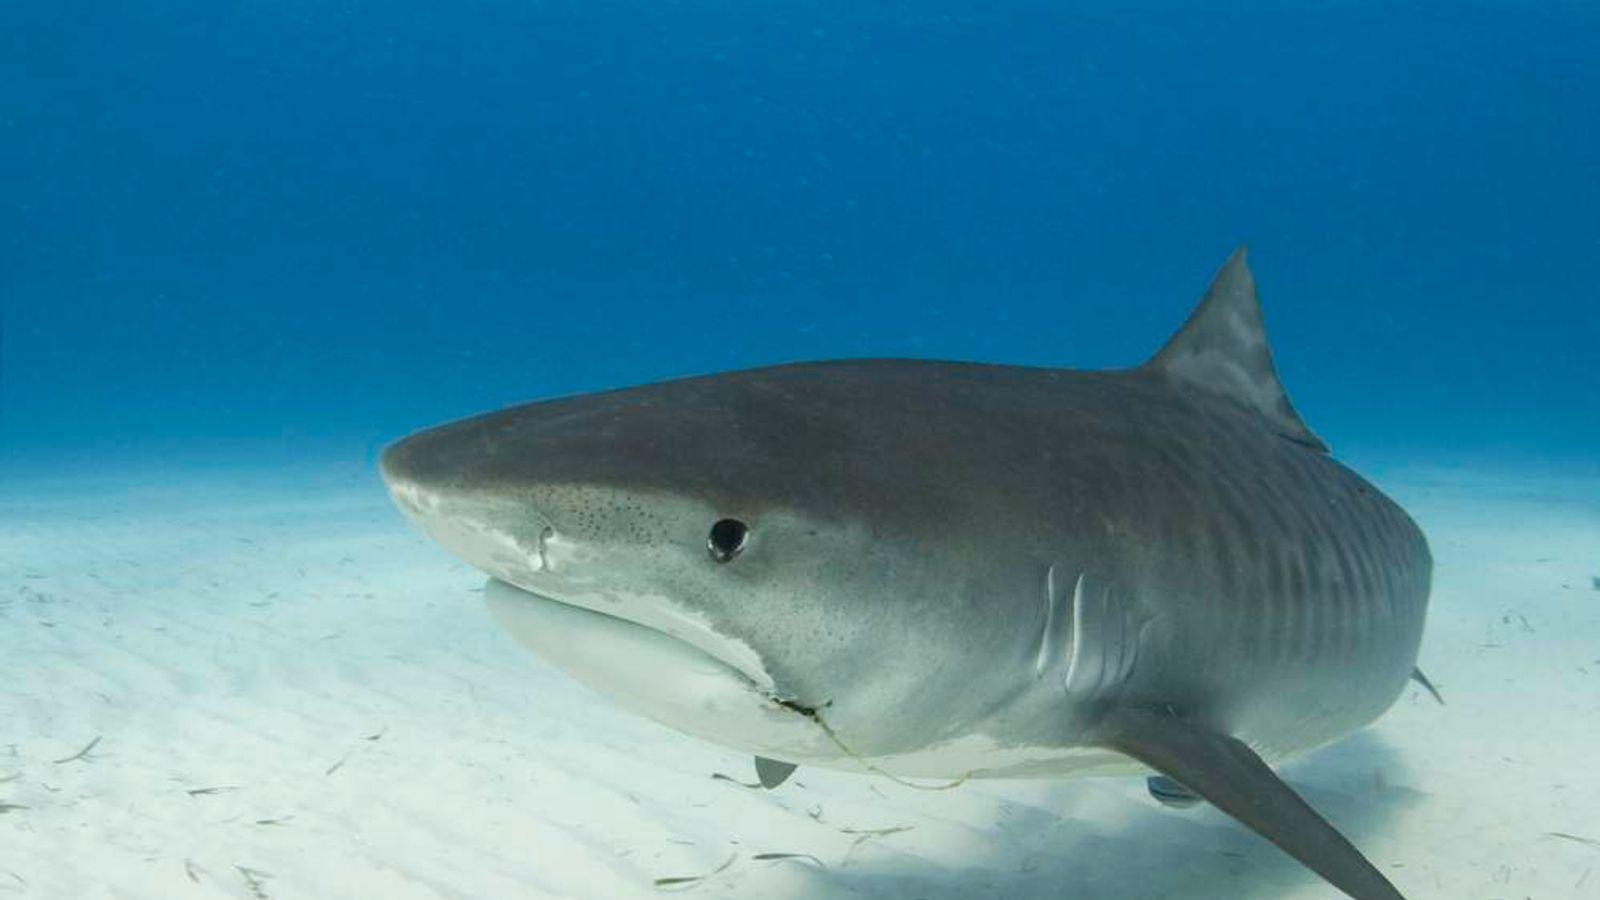 Australia: First Shark Killed As Cull Begins